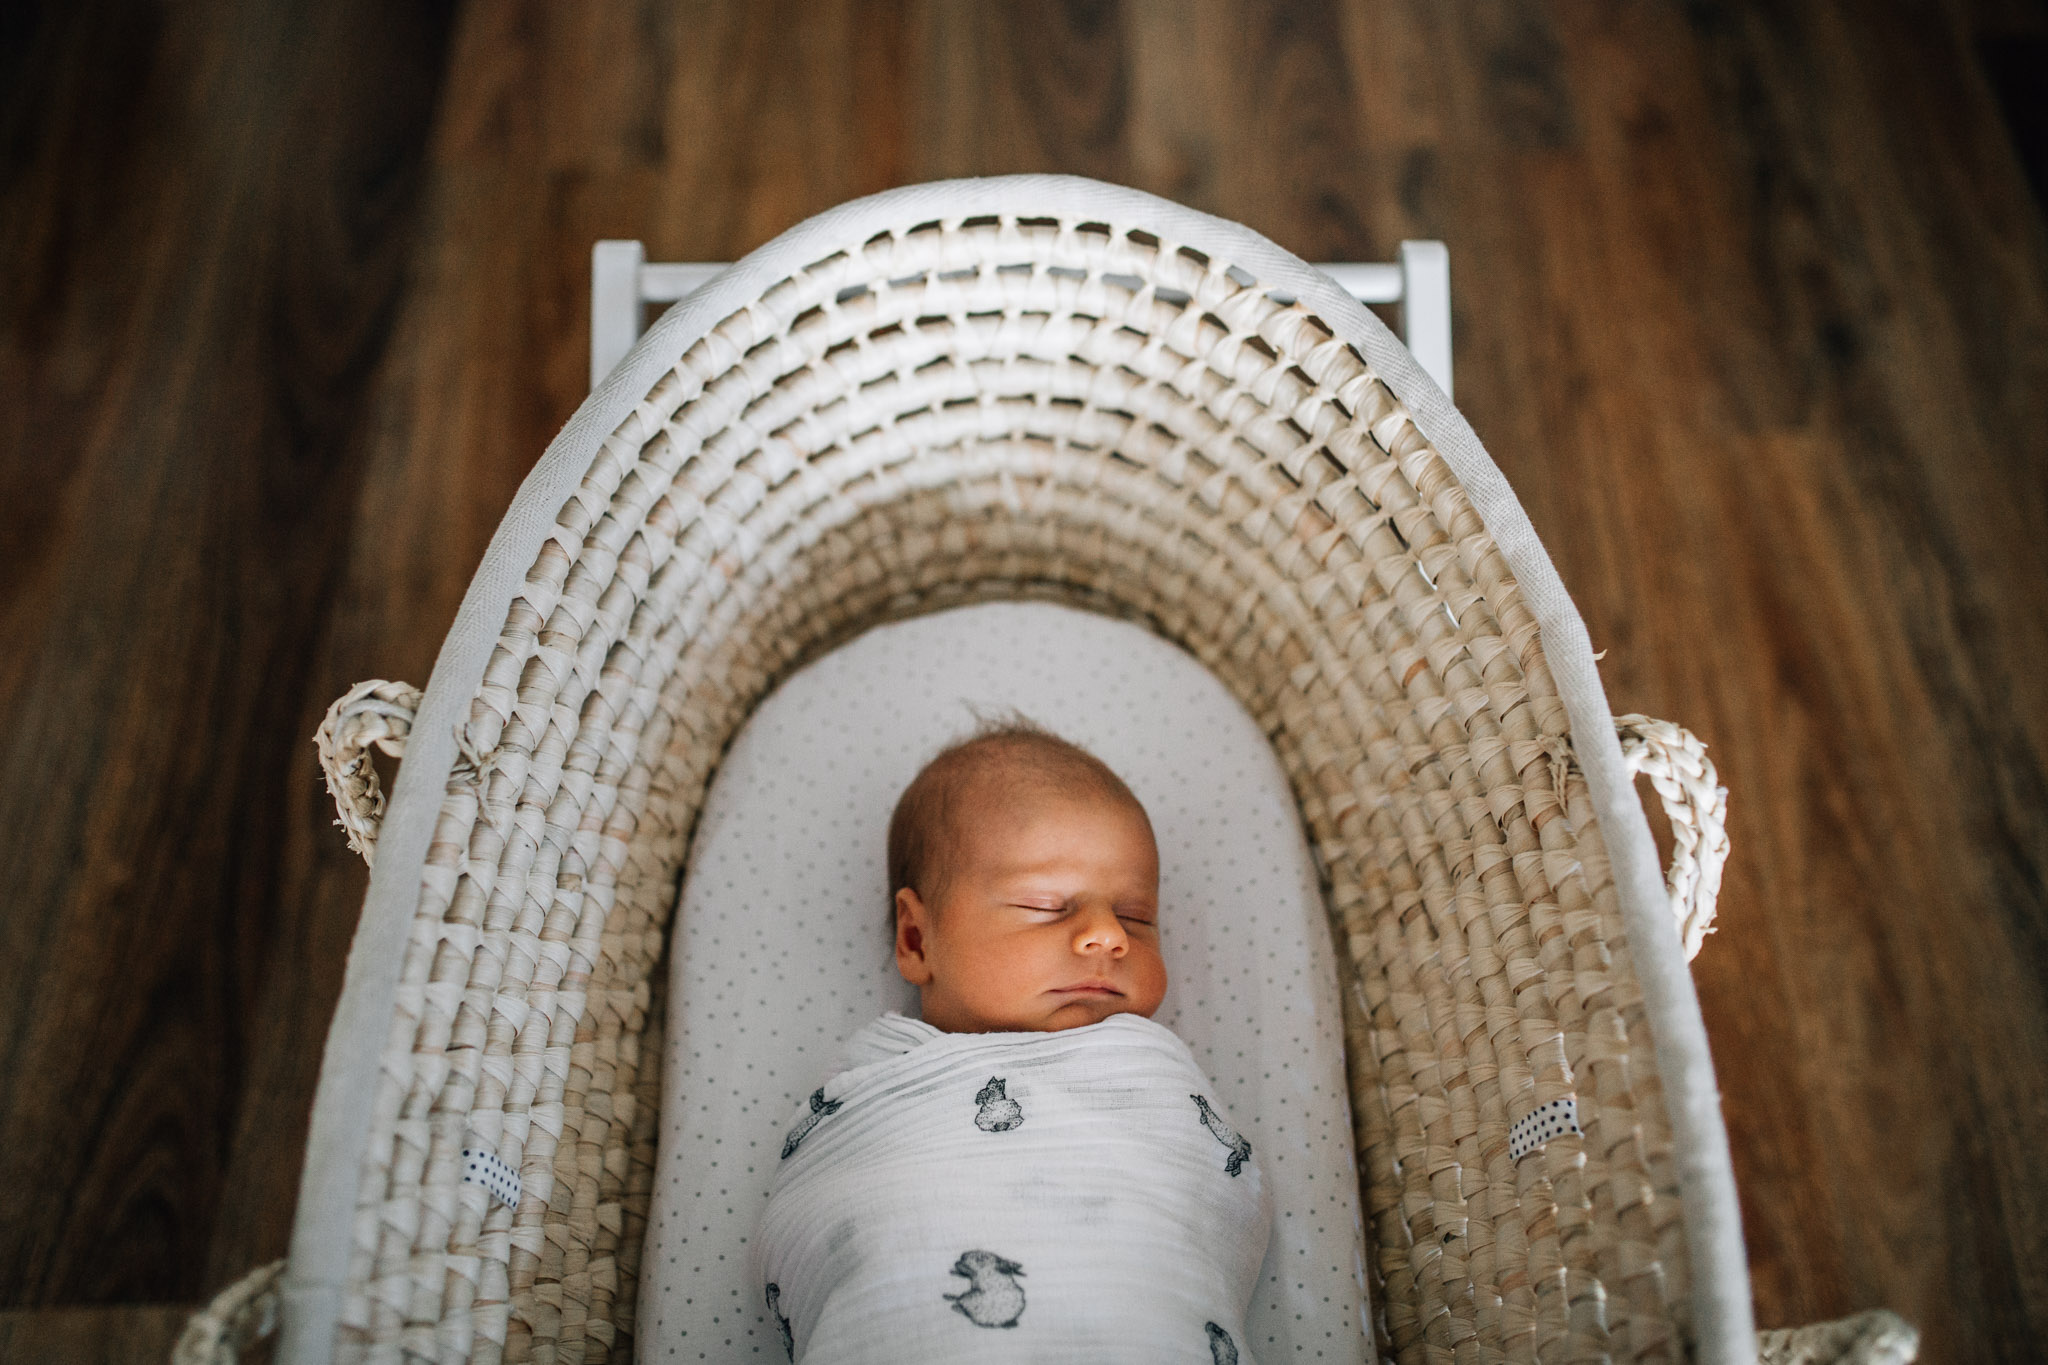 swaddled-baby-sleeping-soundly-in-wicker-bassinet (1 of 1).jpg